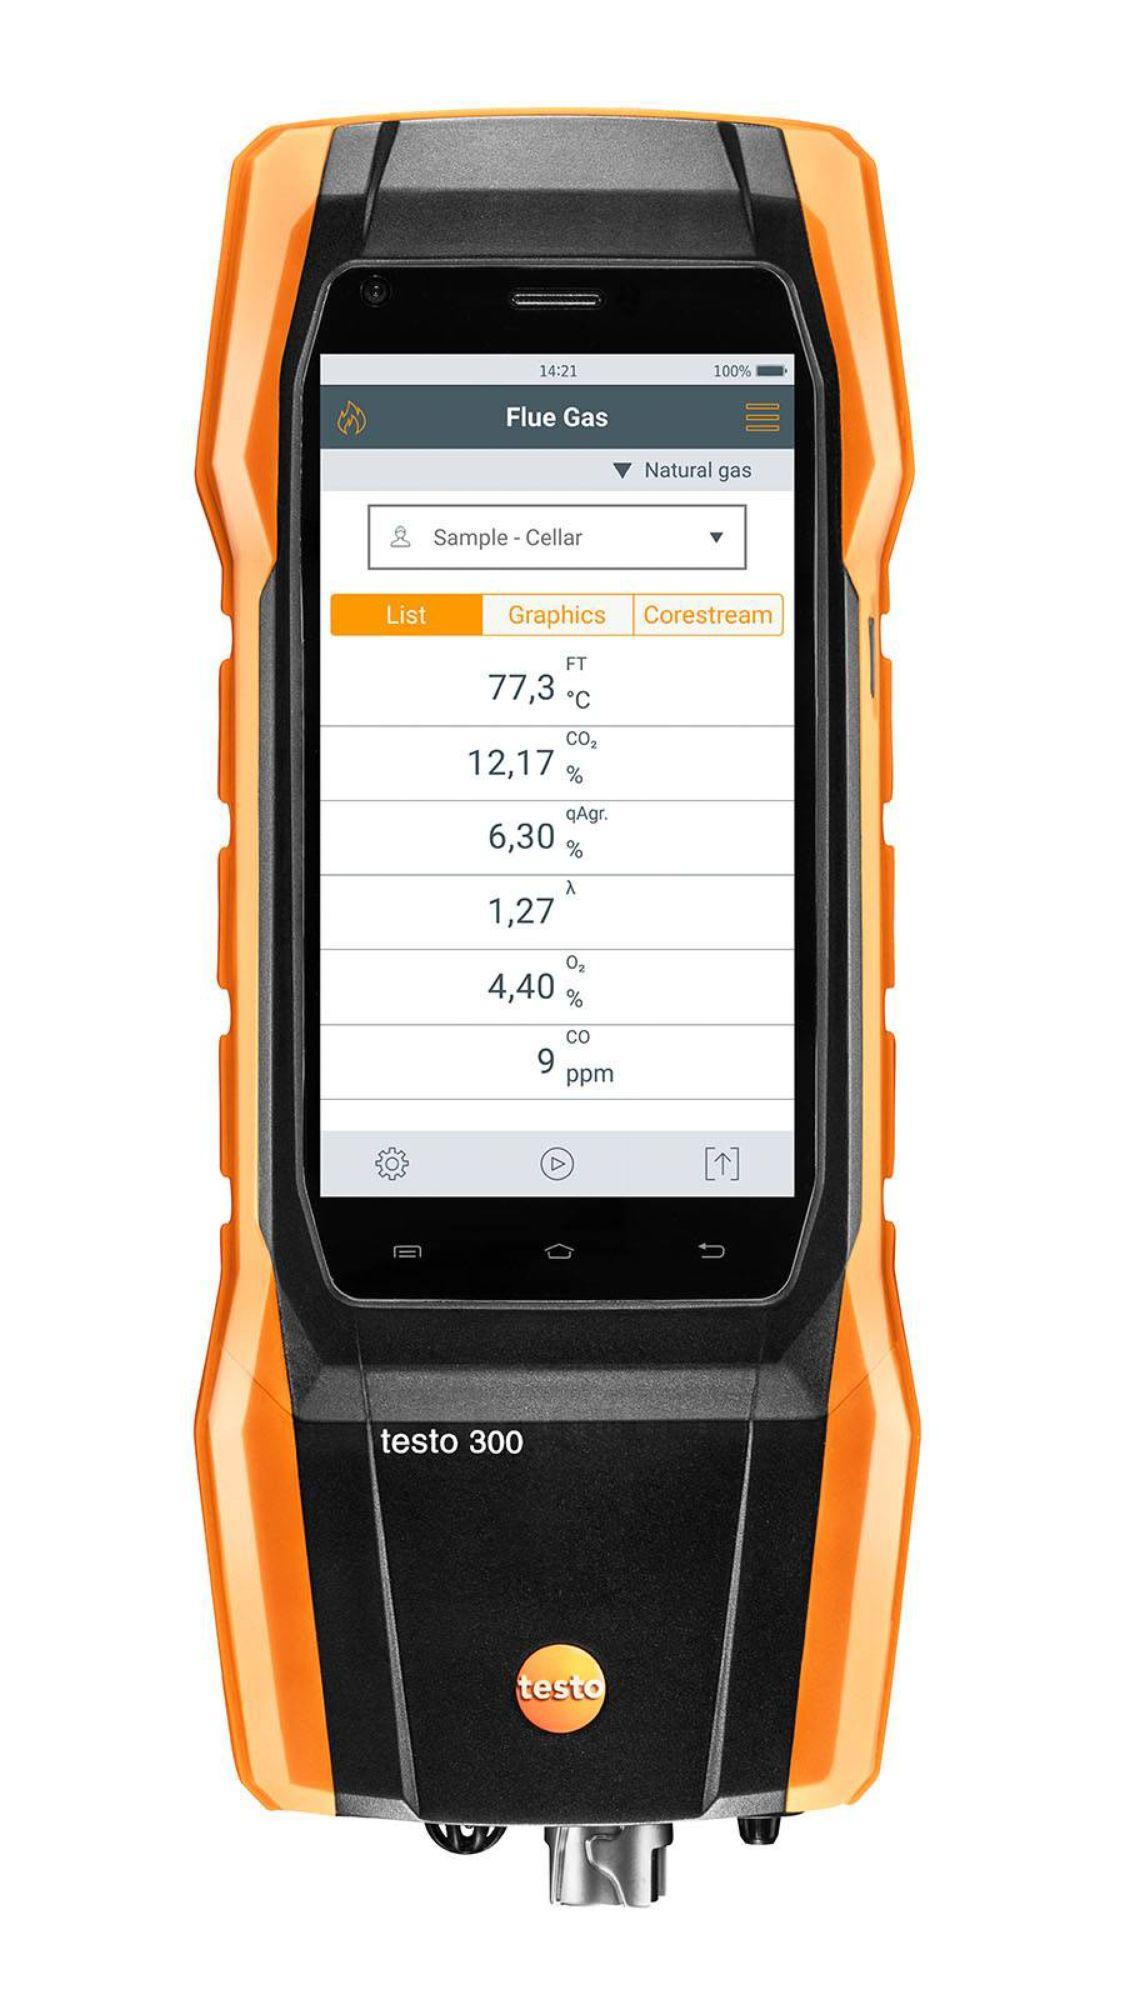 testo 300 flue gas analyzer